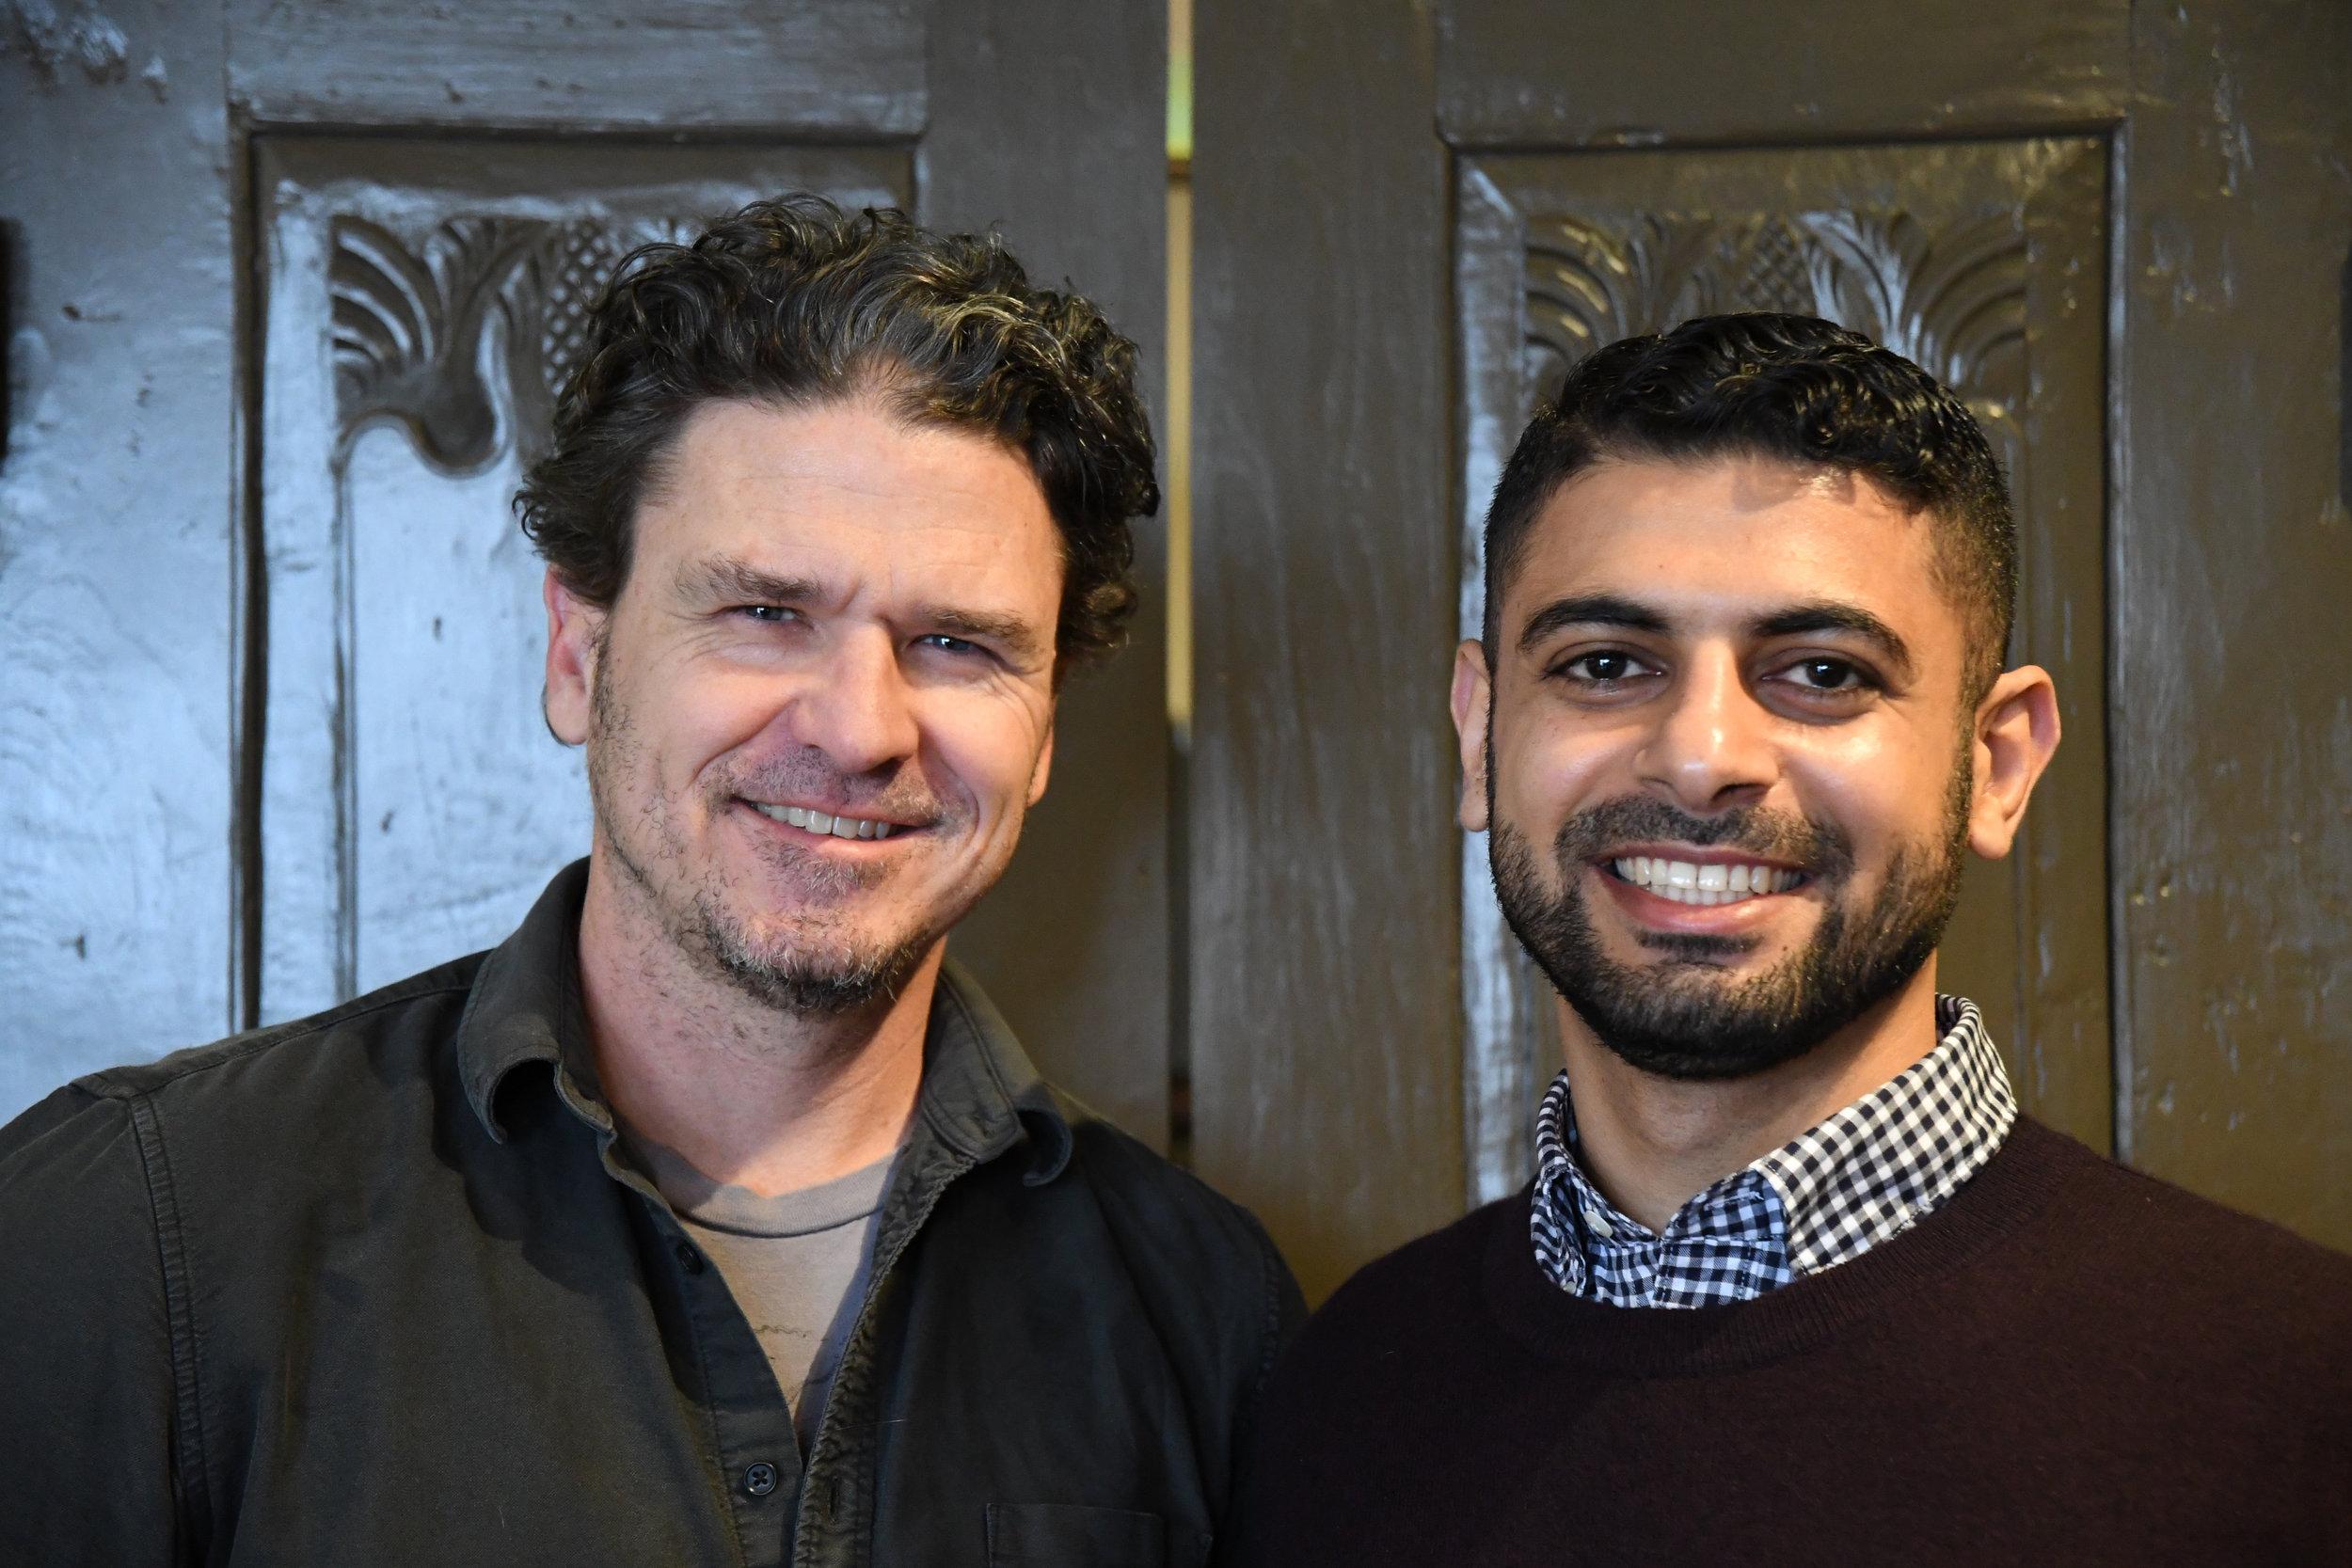 Dave Eggers & Mokhtar Alkhanshali, photo credit: Jeremy Stern